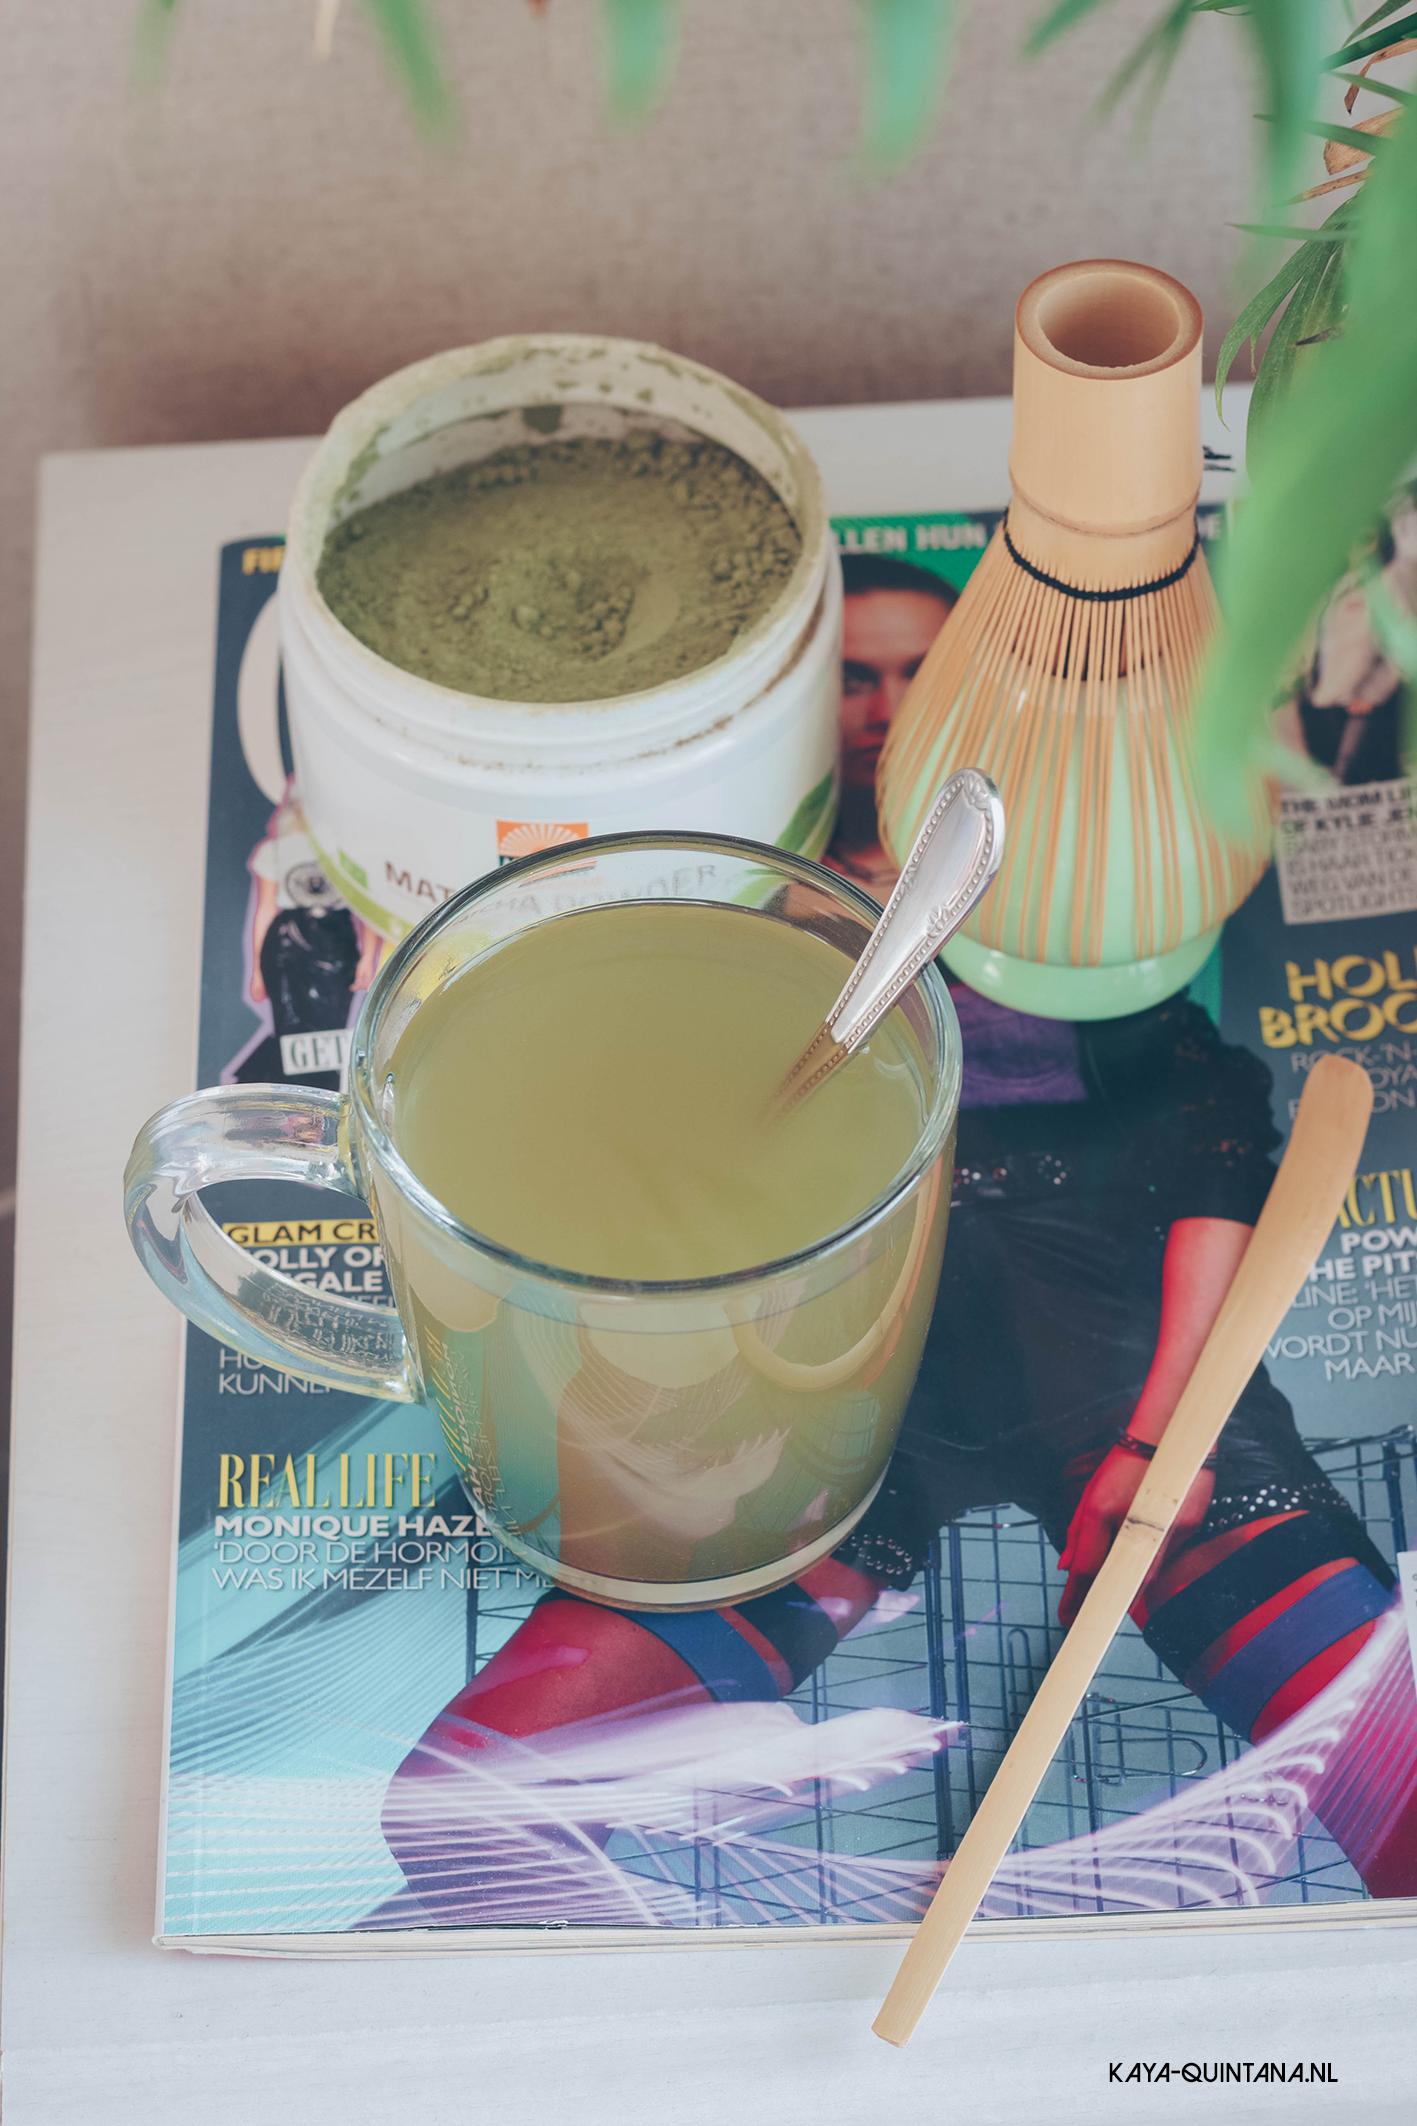 Matcha tea experience